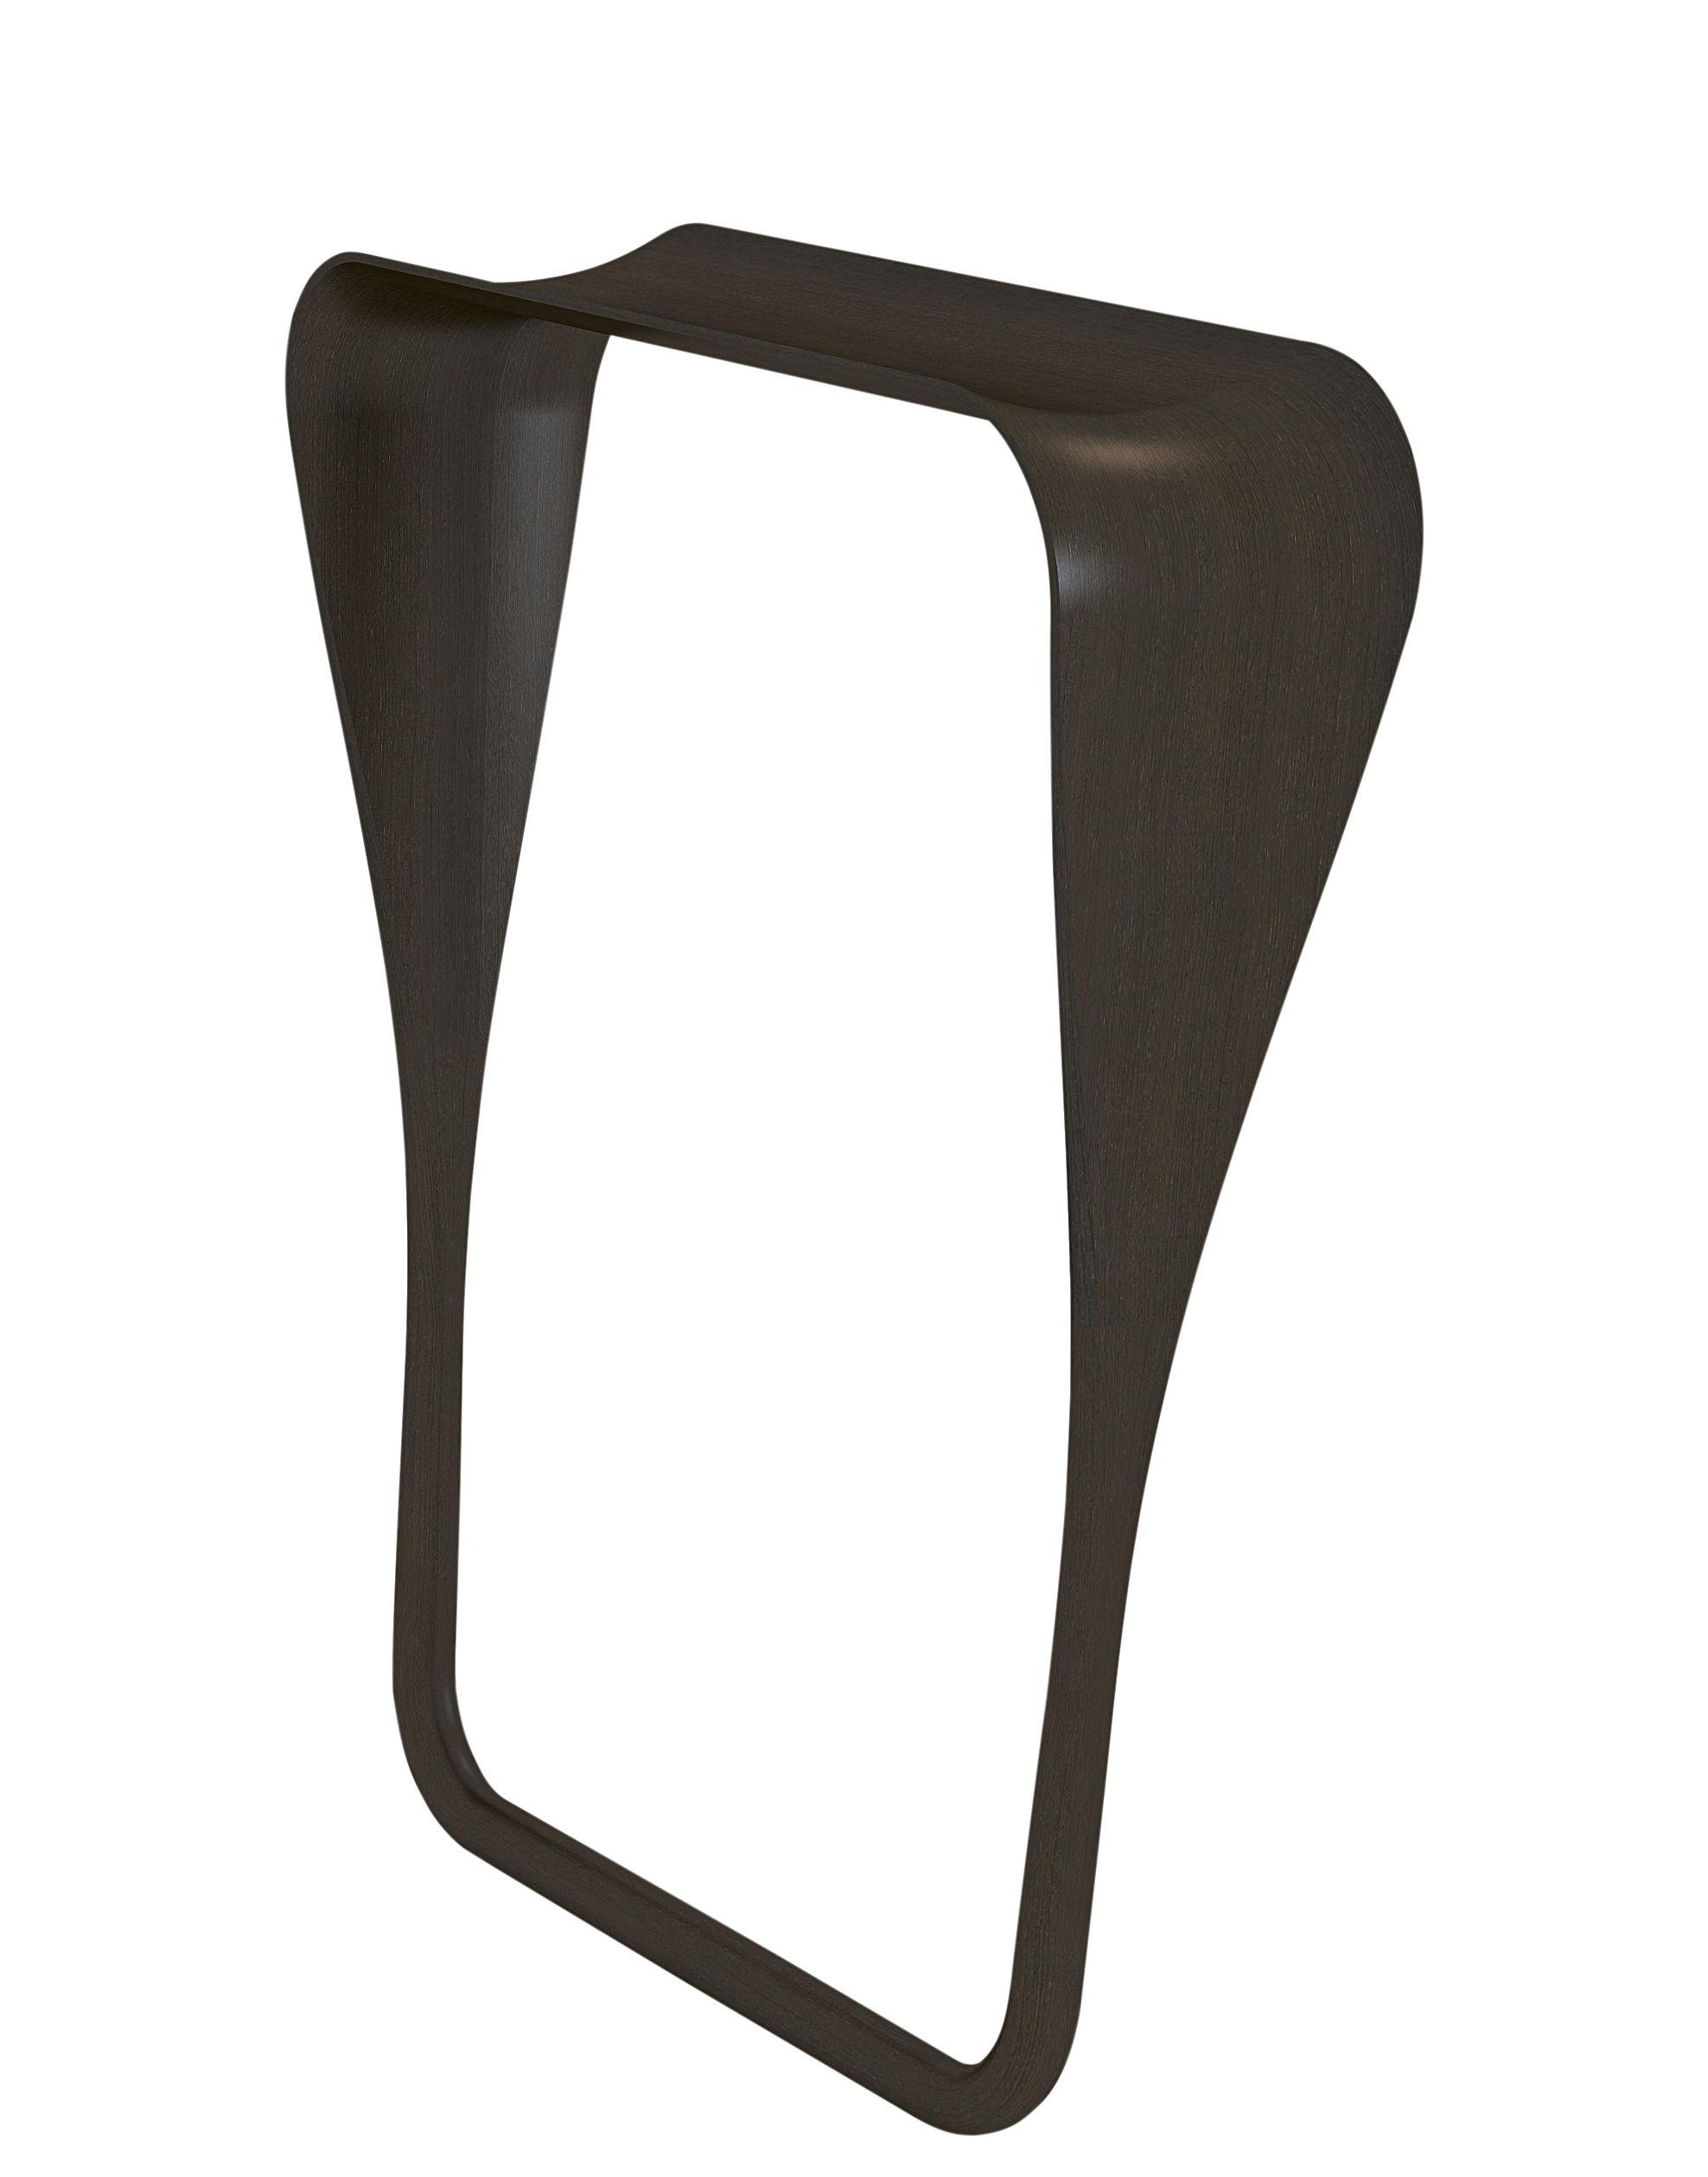 Möbel - Konsole - Tadaima Konsole / L 73 cm x H 88 cm - ClassiCon - Braun - getönte Eiche